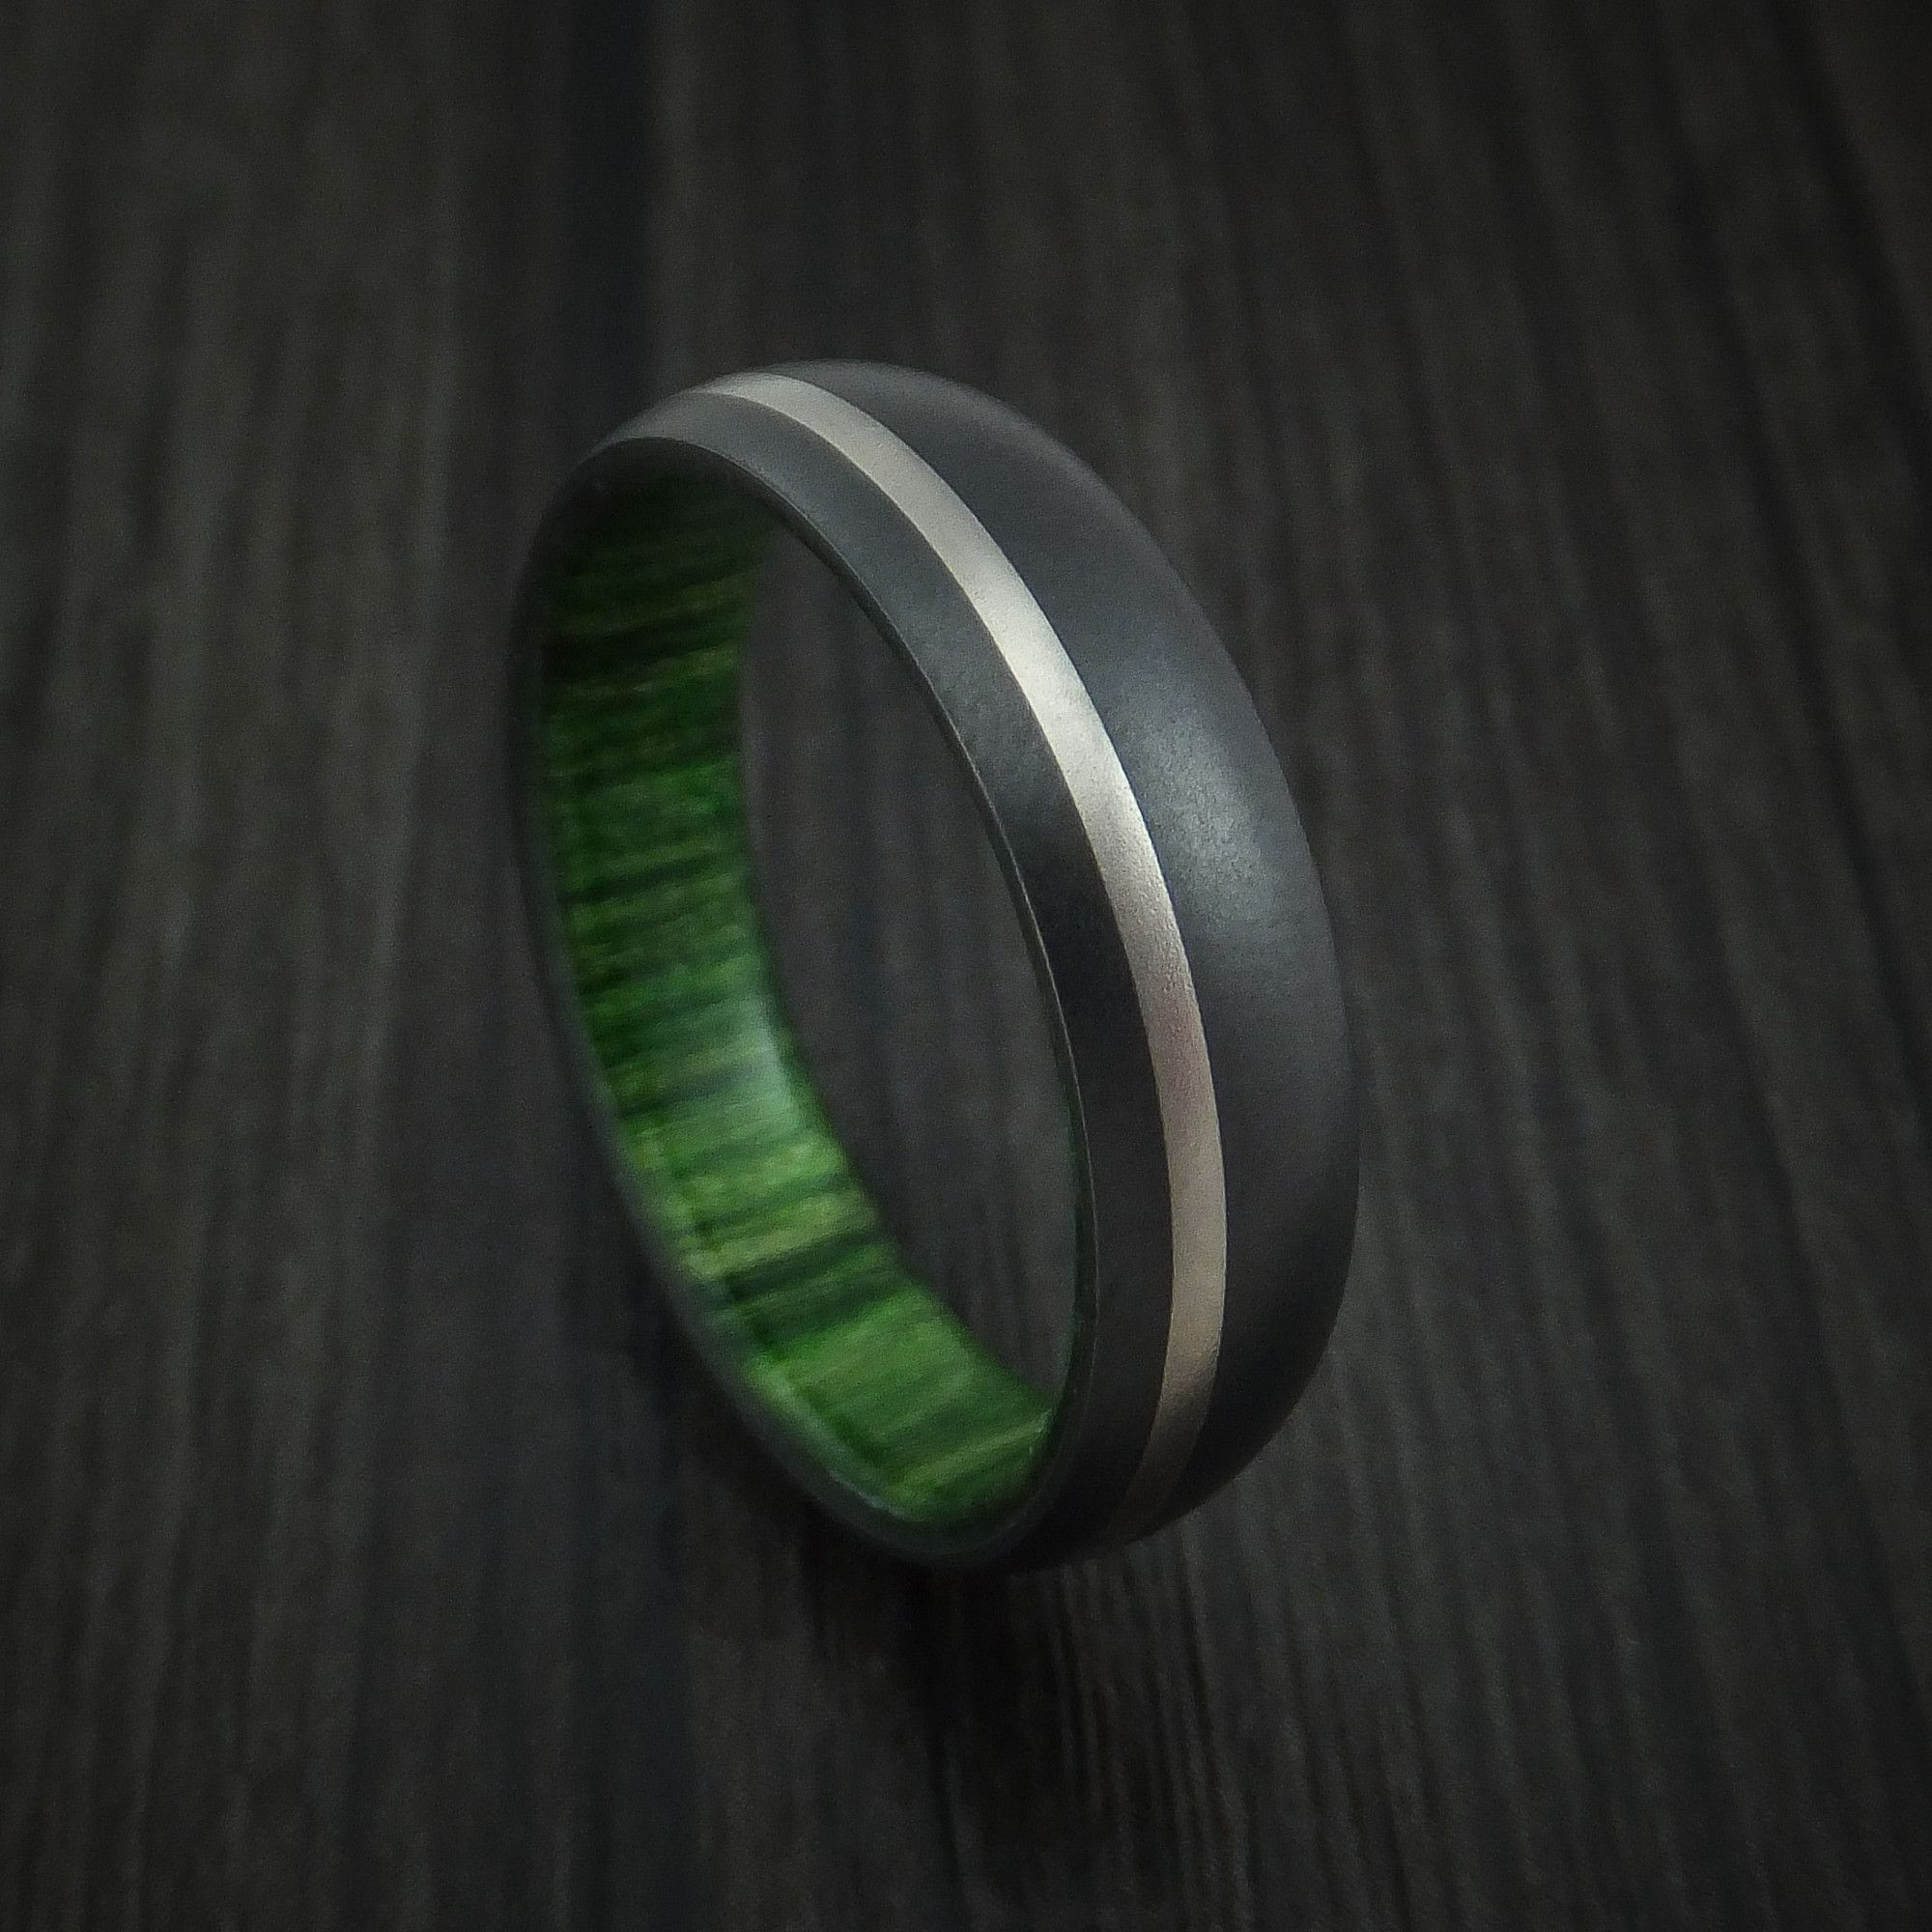 Black Zirconium Ring with Palladium Inlay and Jade Wood Sleeve